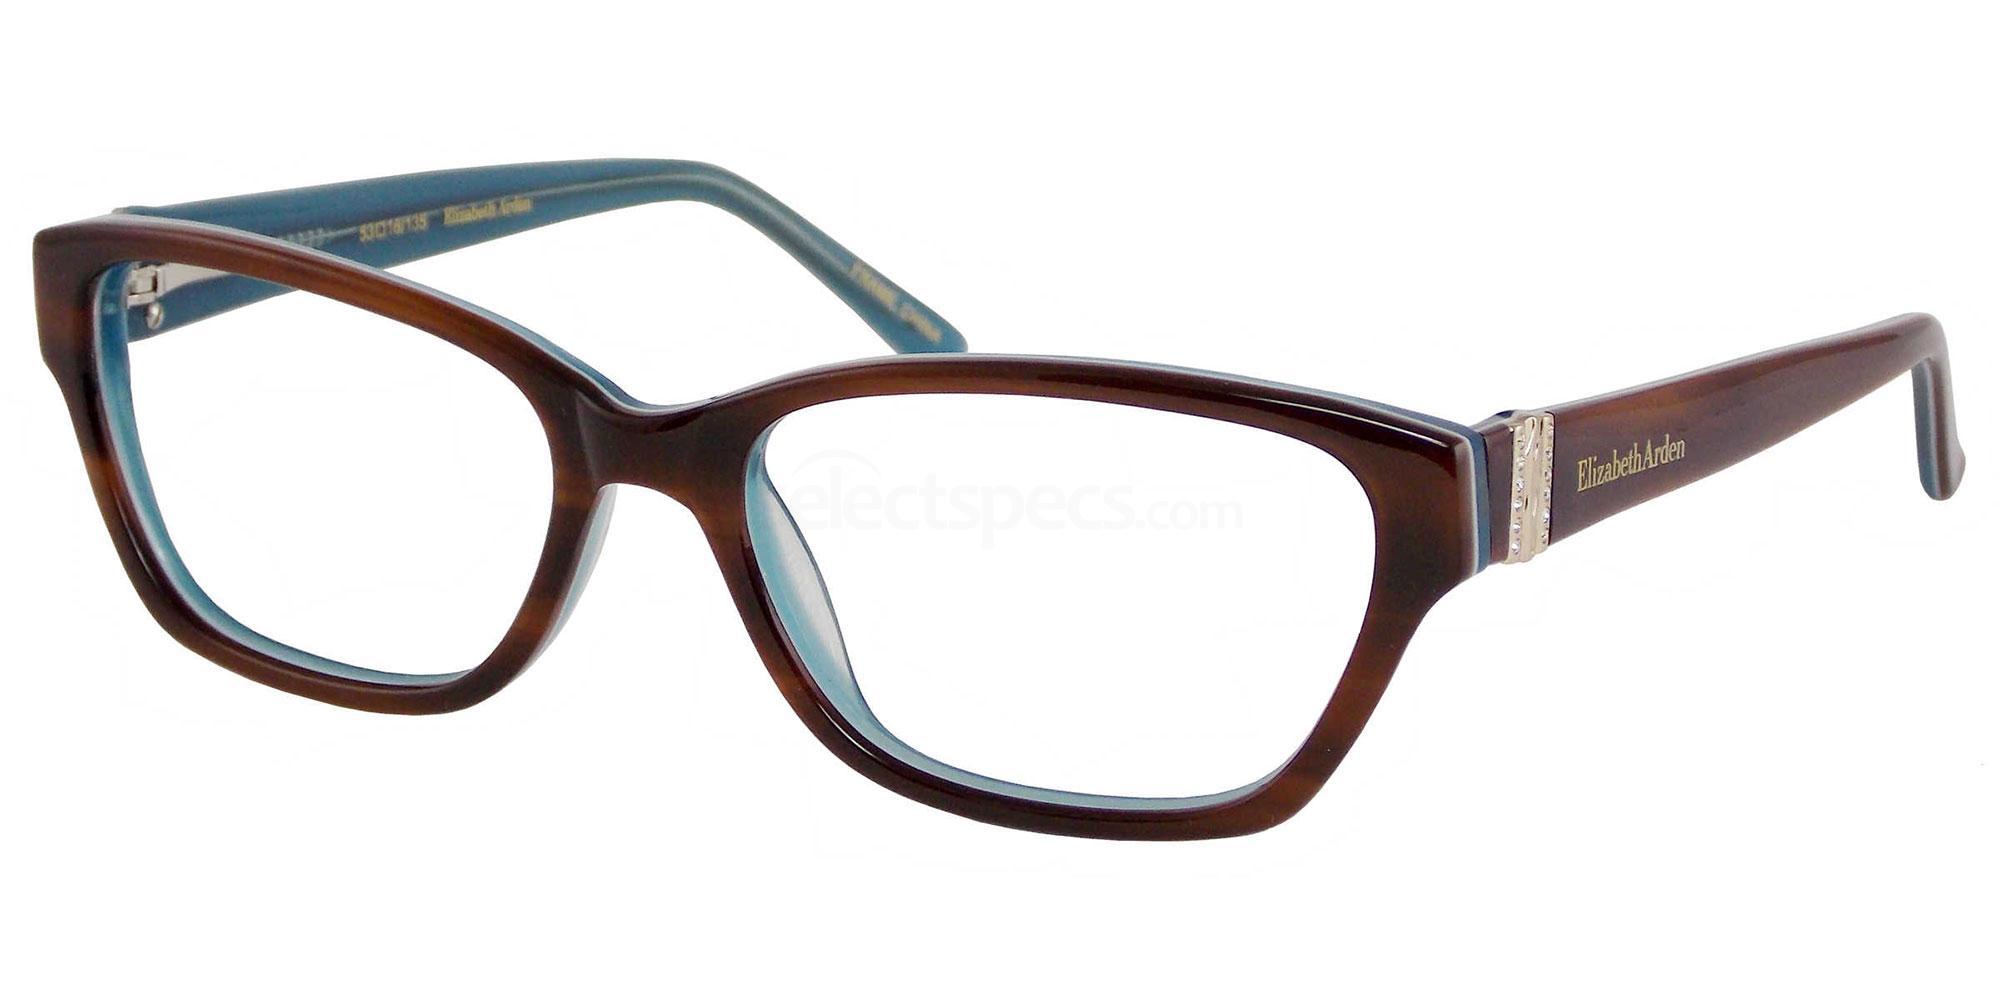 01 EA1130 Glasses, Elizabeth Arden